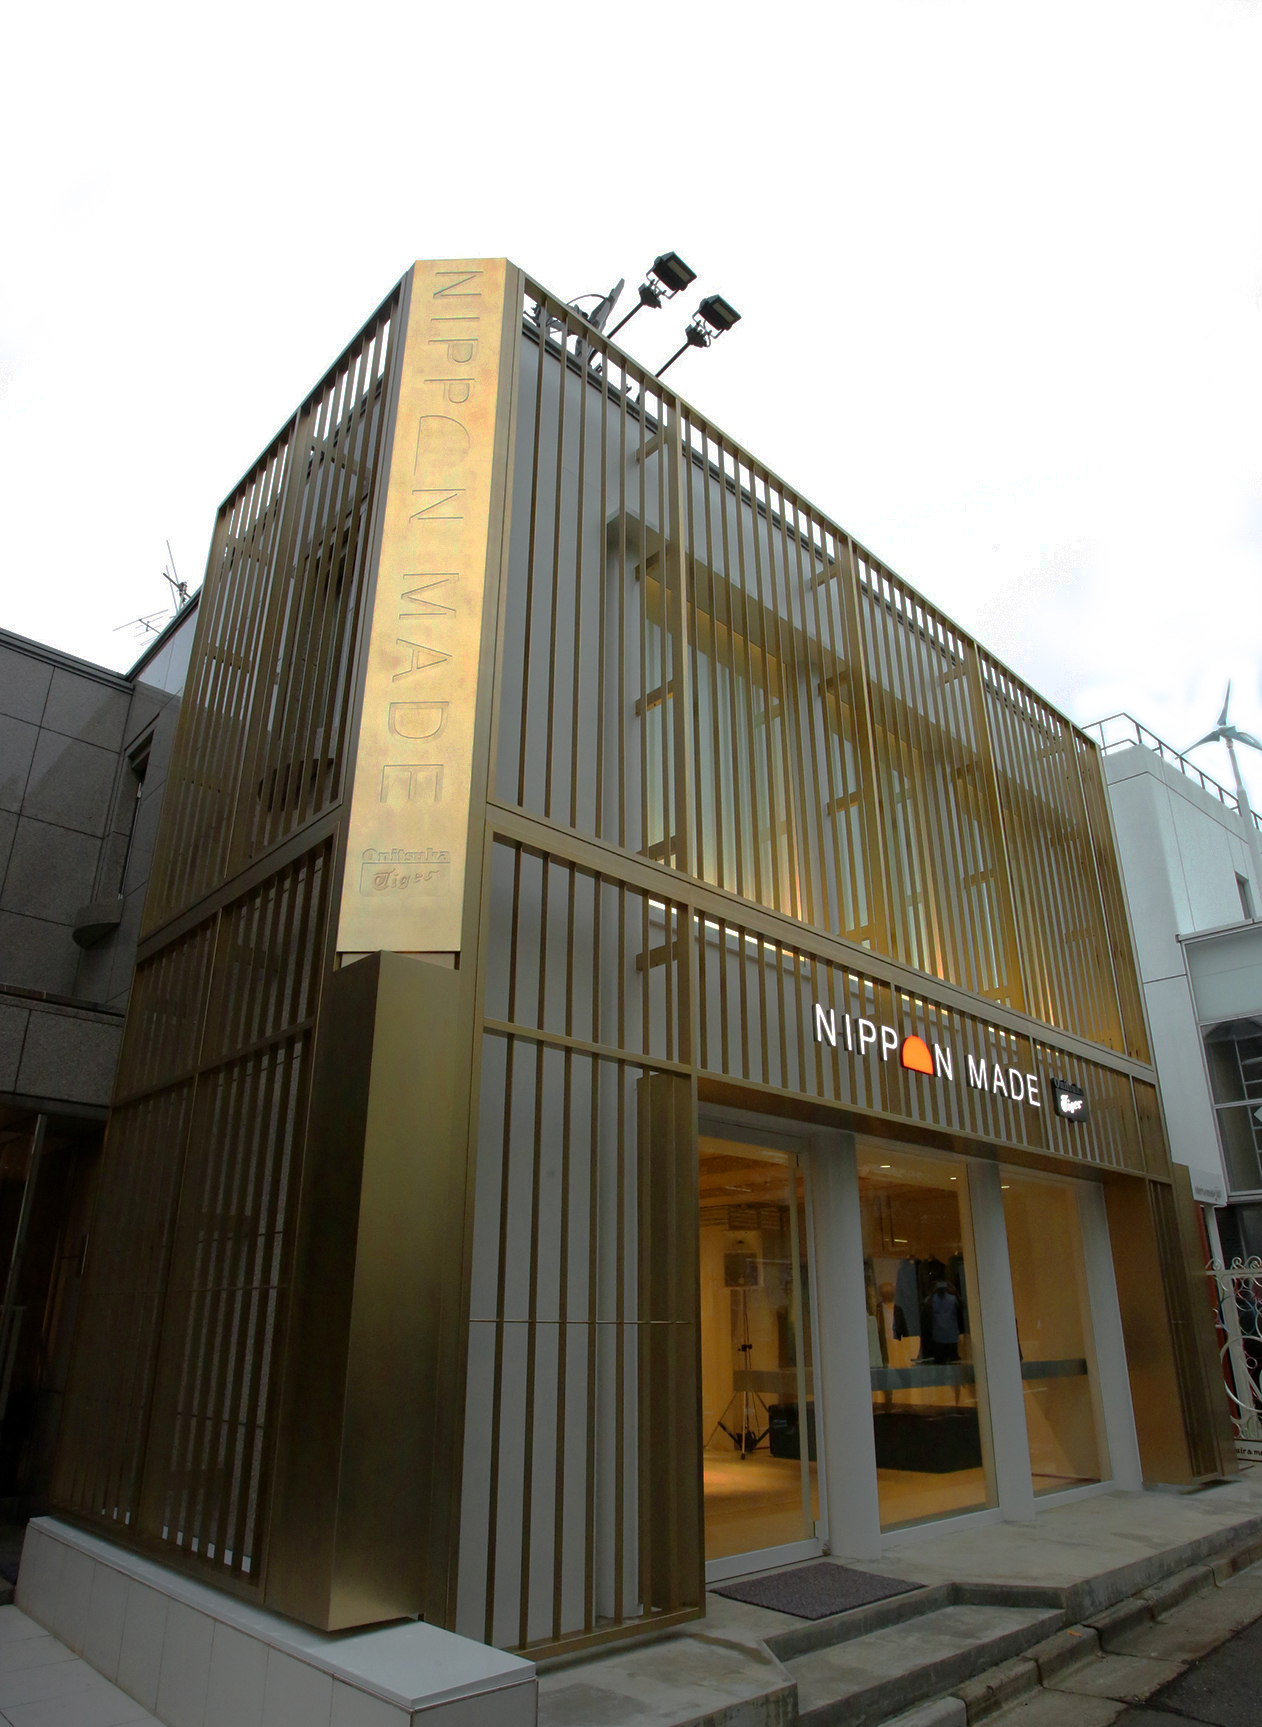 Onitsuka Tiger NIPPON MADE Retail Store